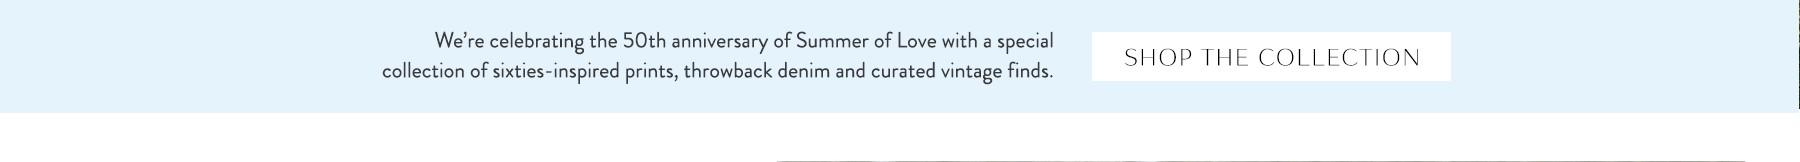 Shop the Summer of Love Lookbook